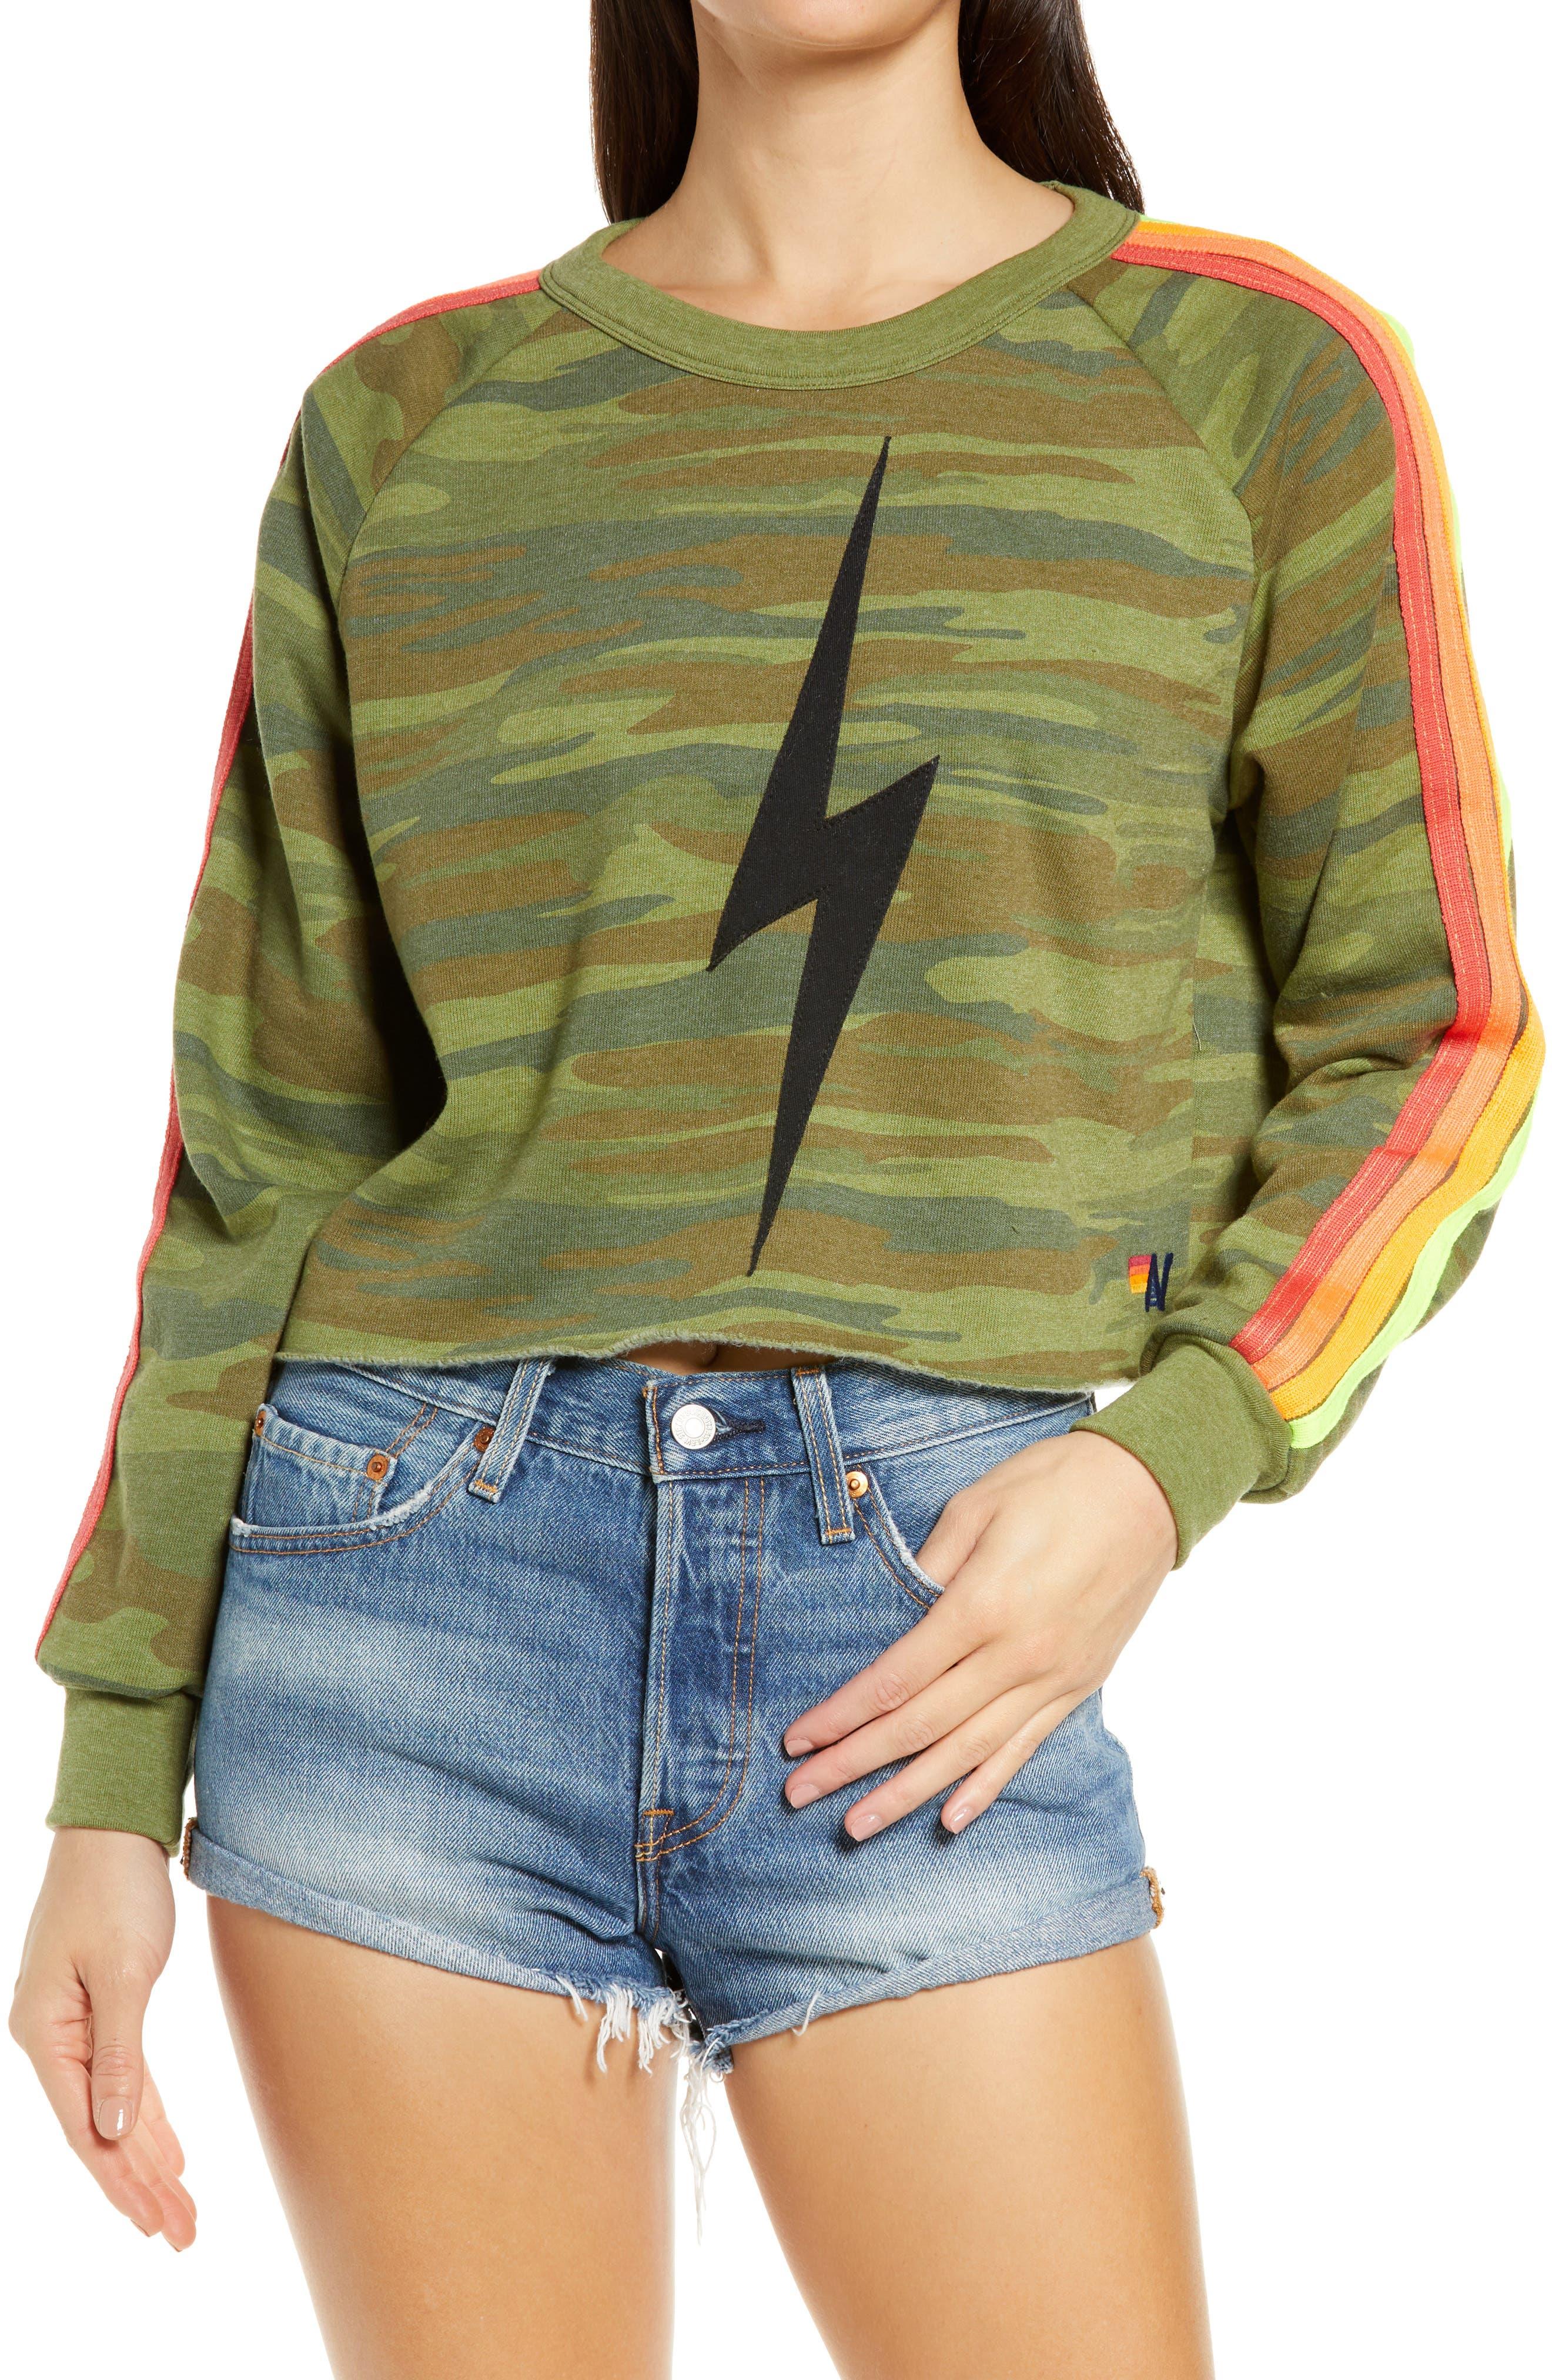 Bolt Crop Sweatshirt